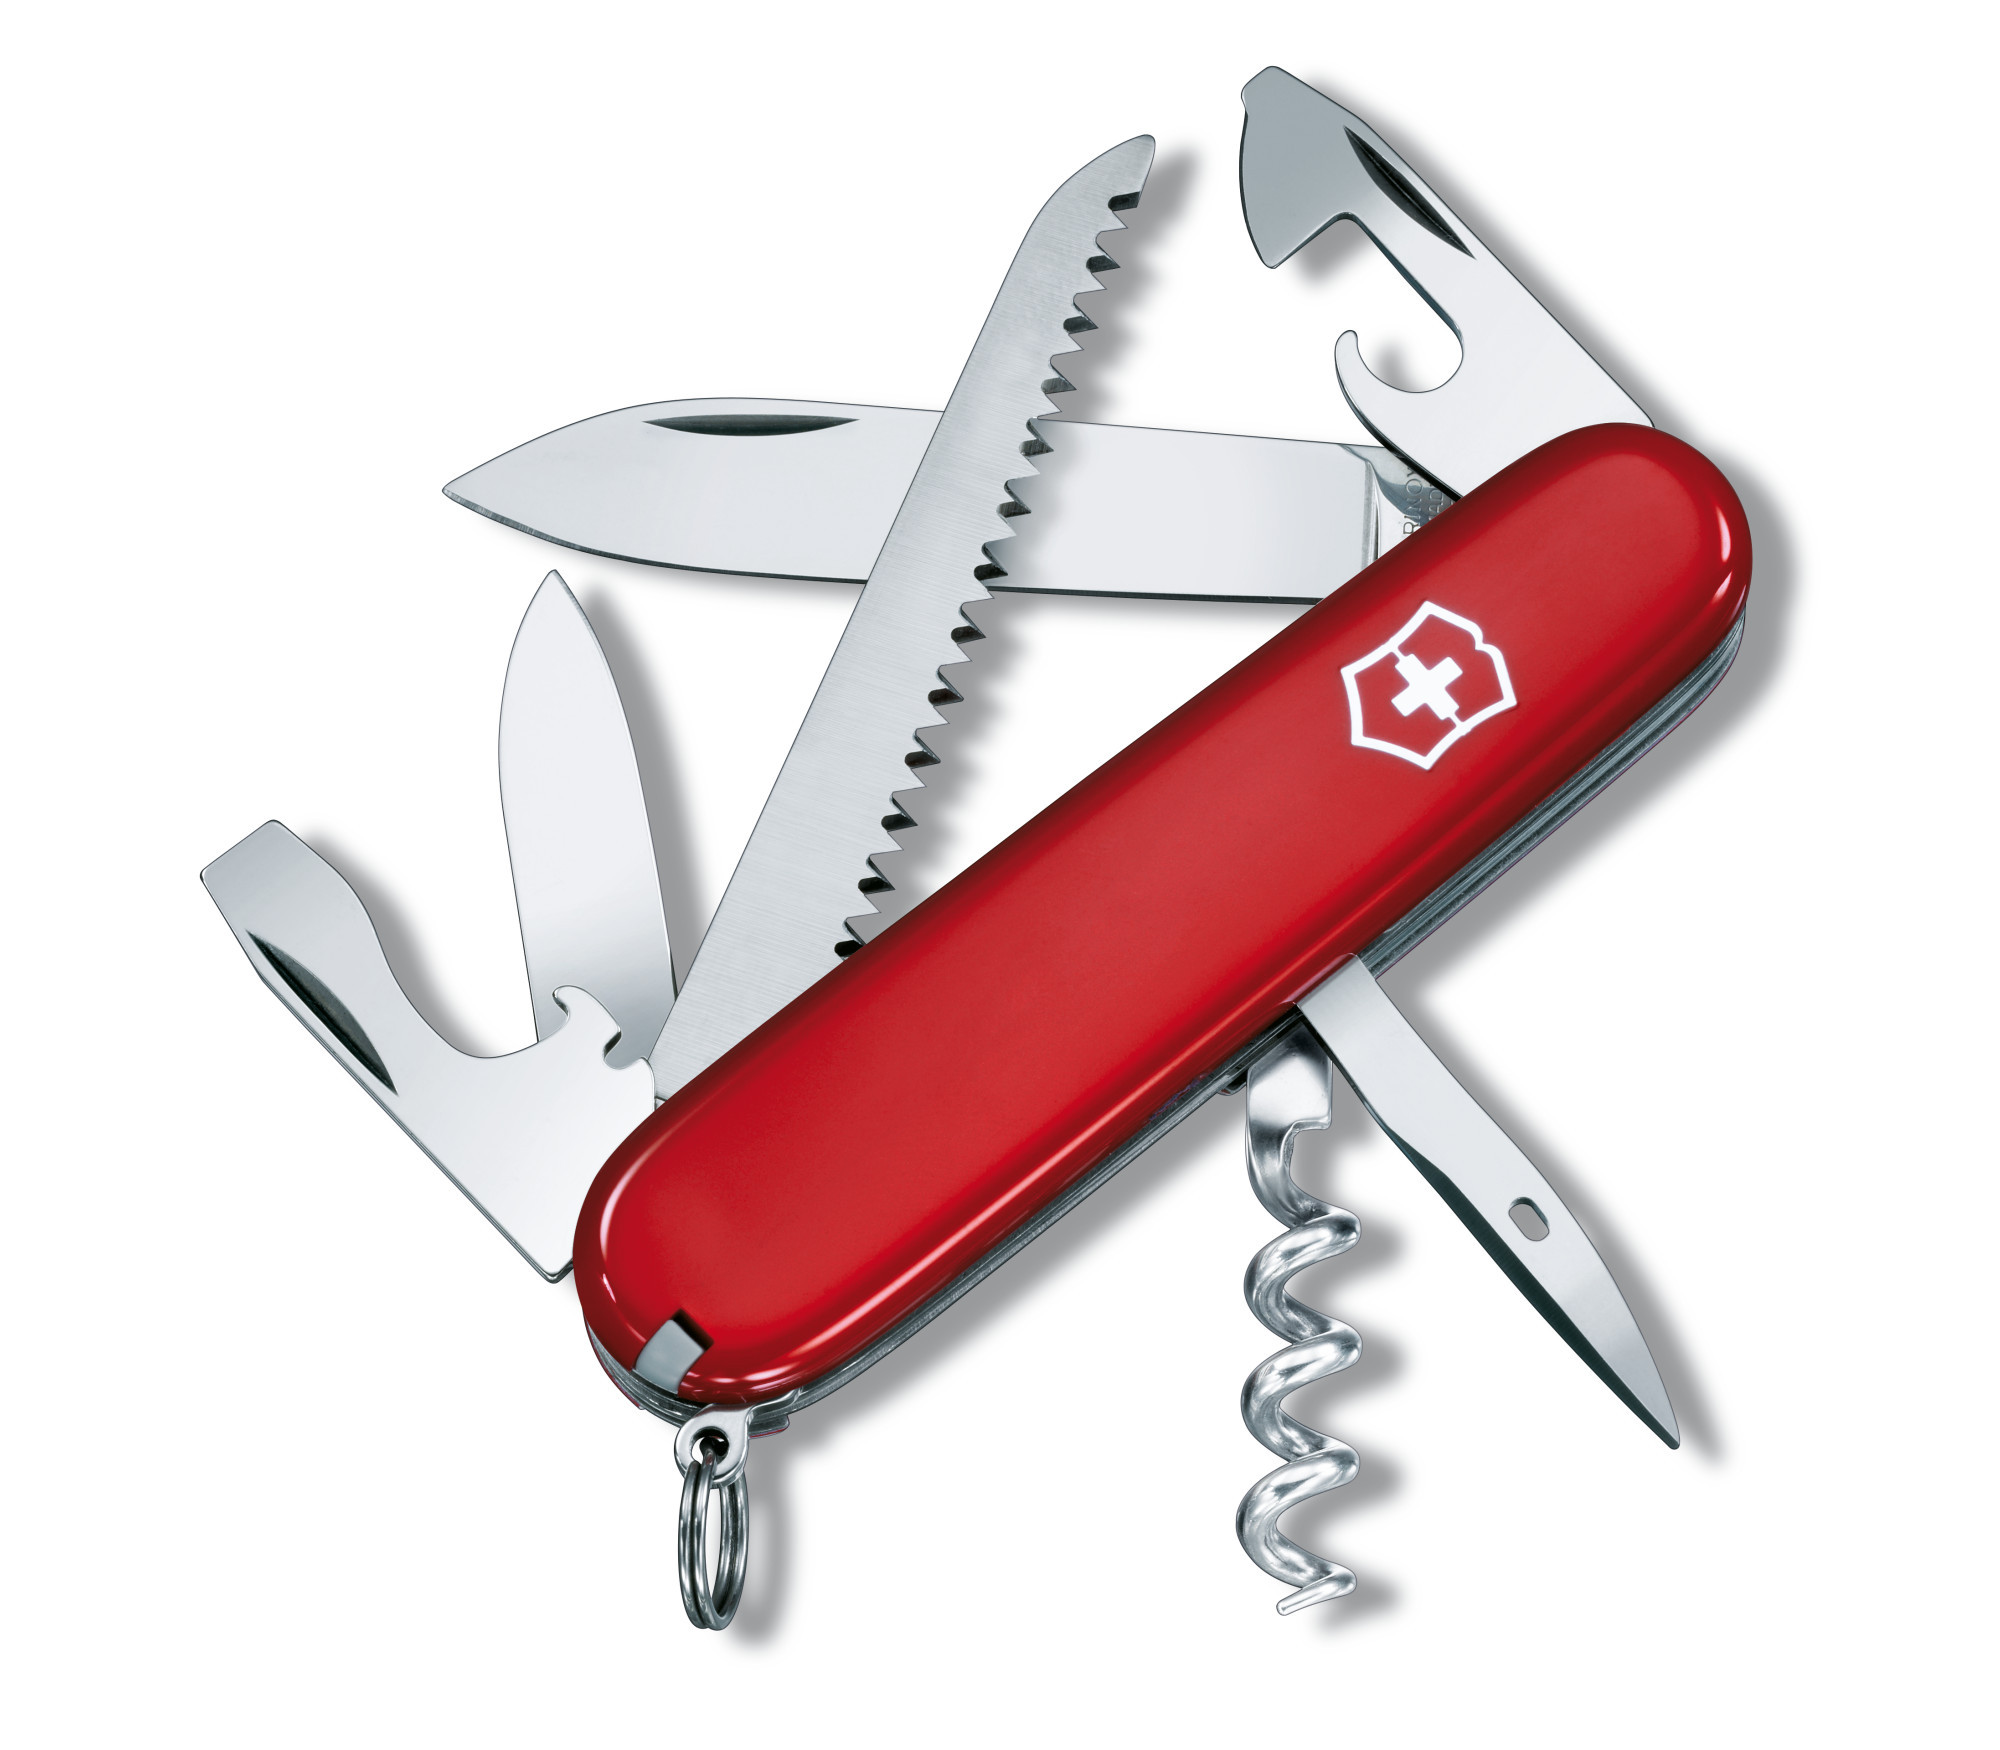 Нож Victorinox Camper Red 91мм/13предм (1.3613)